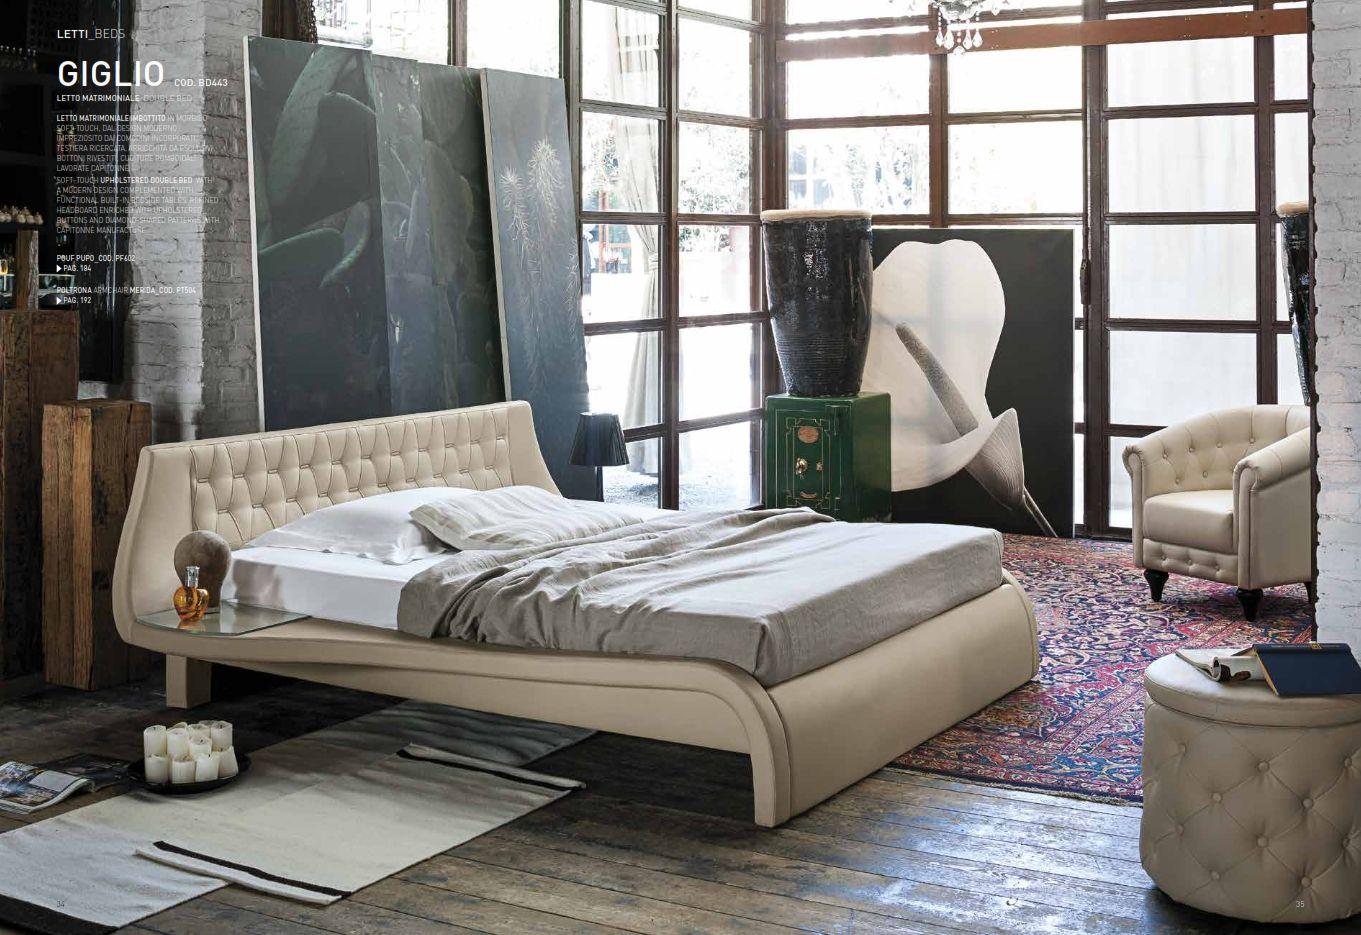 Leder-Schlafzimmer - Leder Schlafzimmer Target Point Serie GiglioDie ...